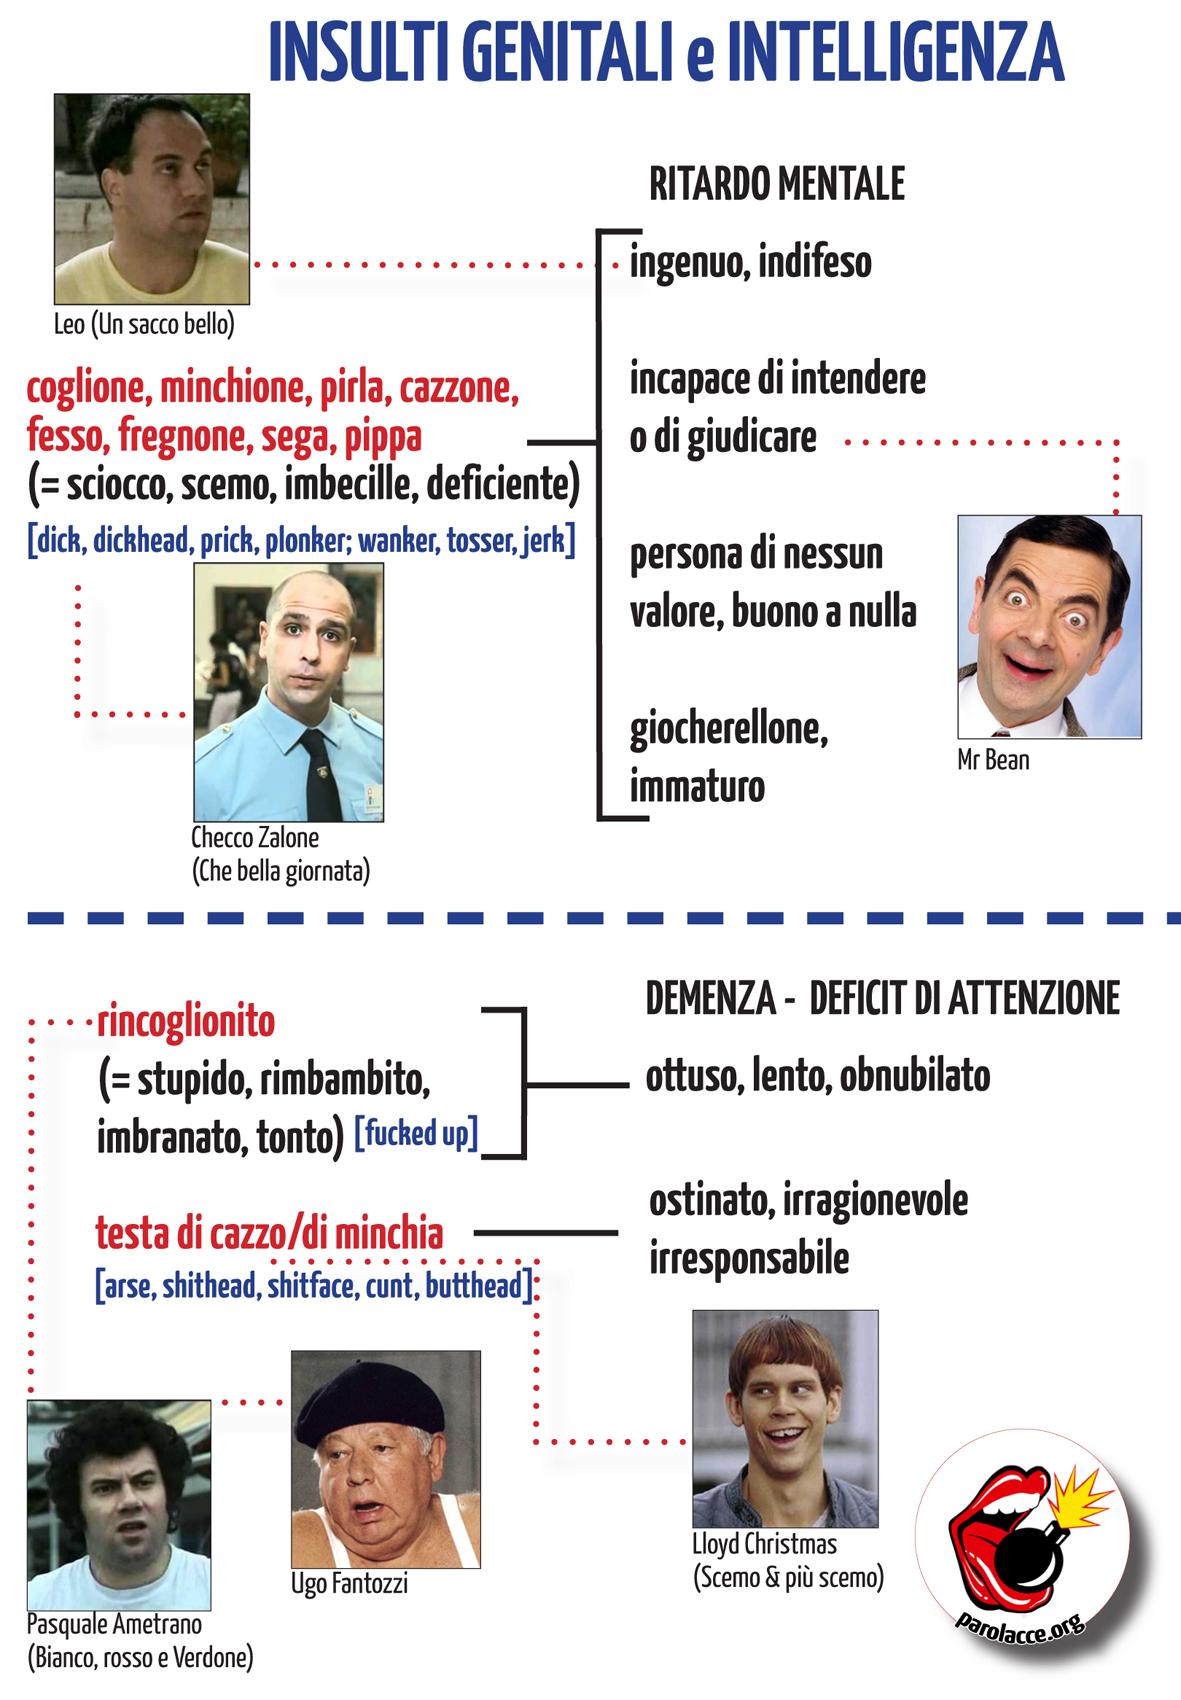 insultiGenitali1